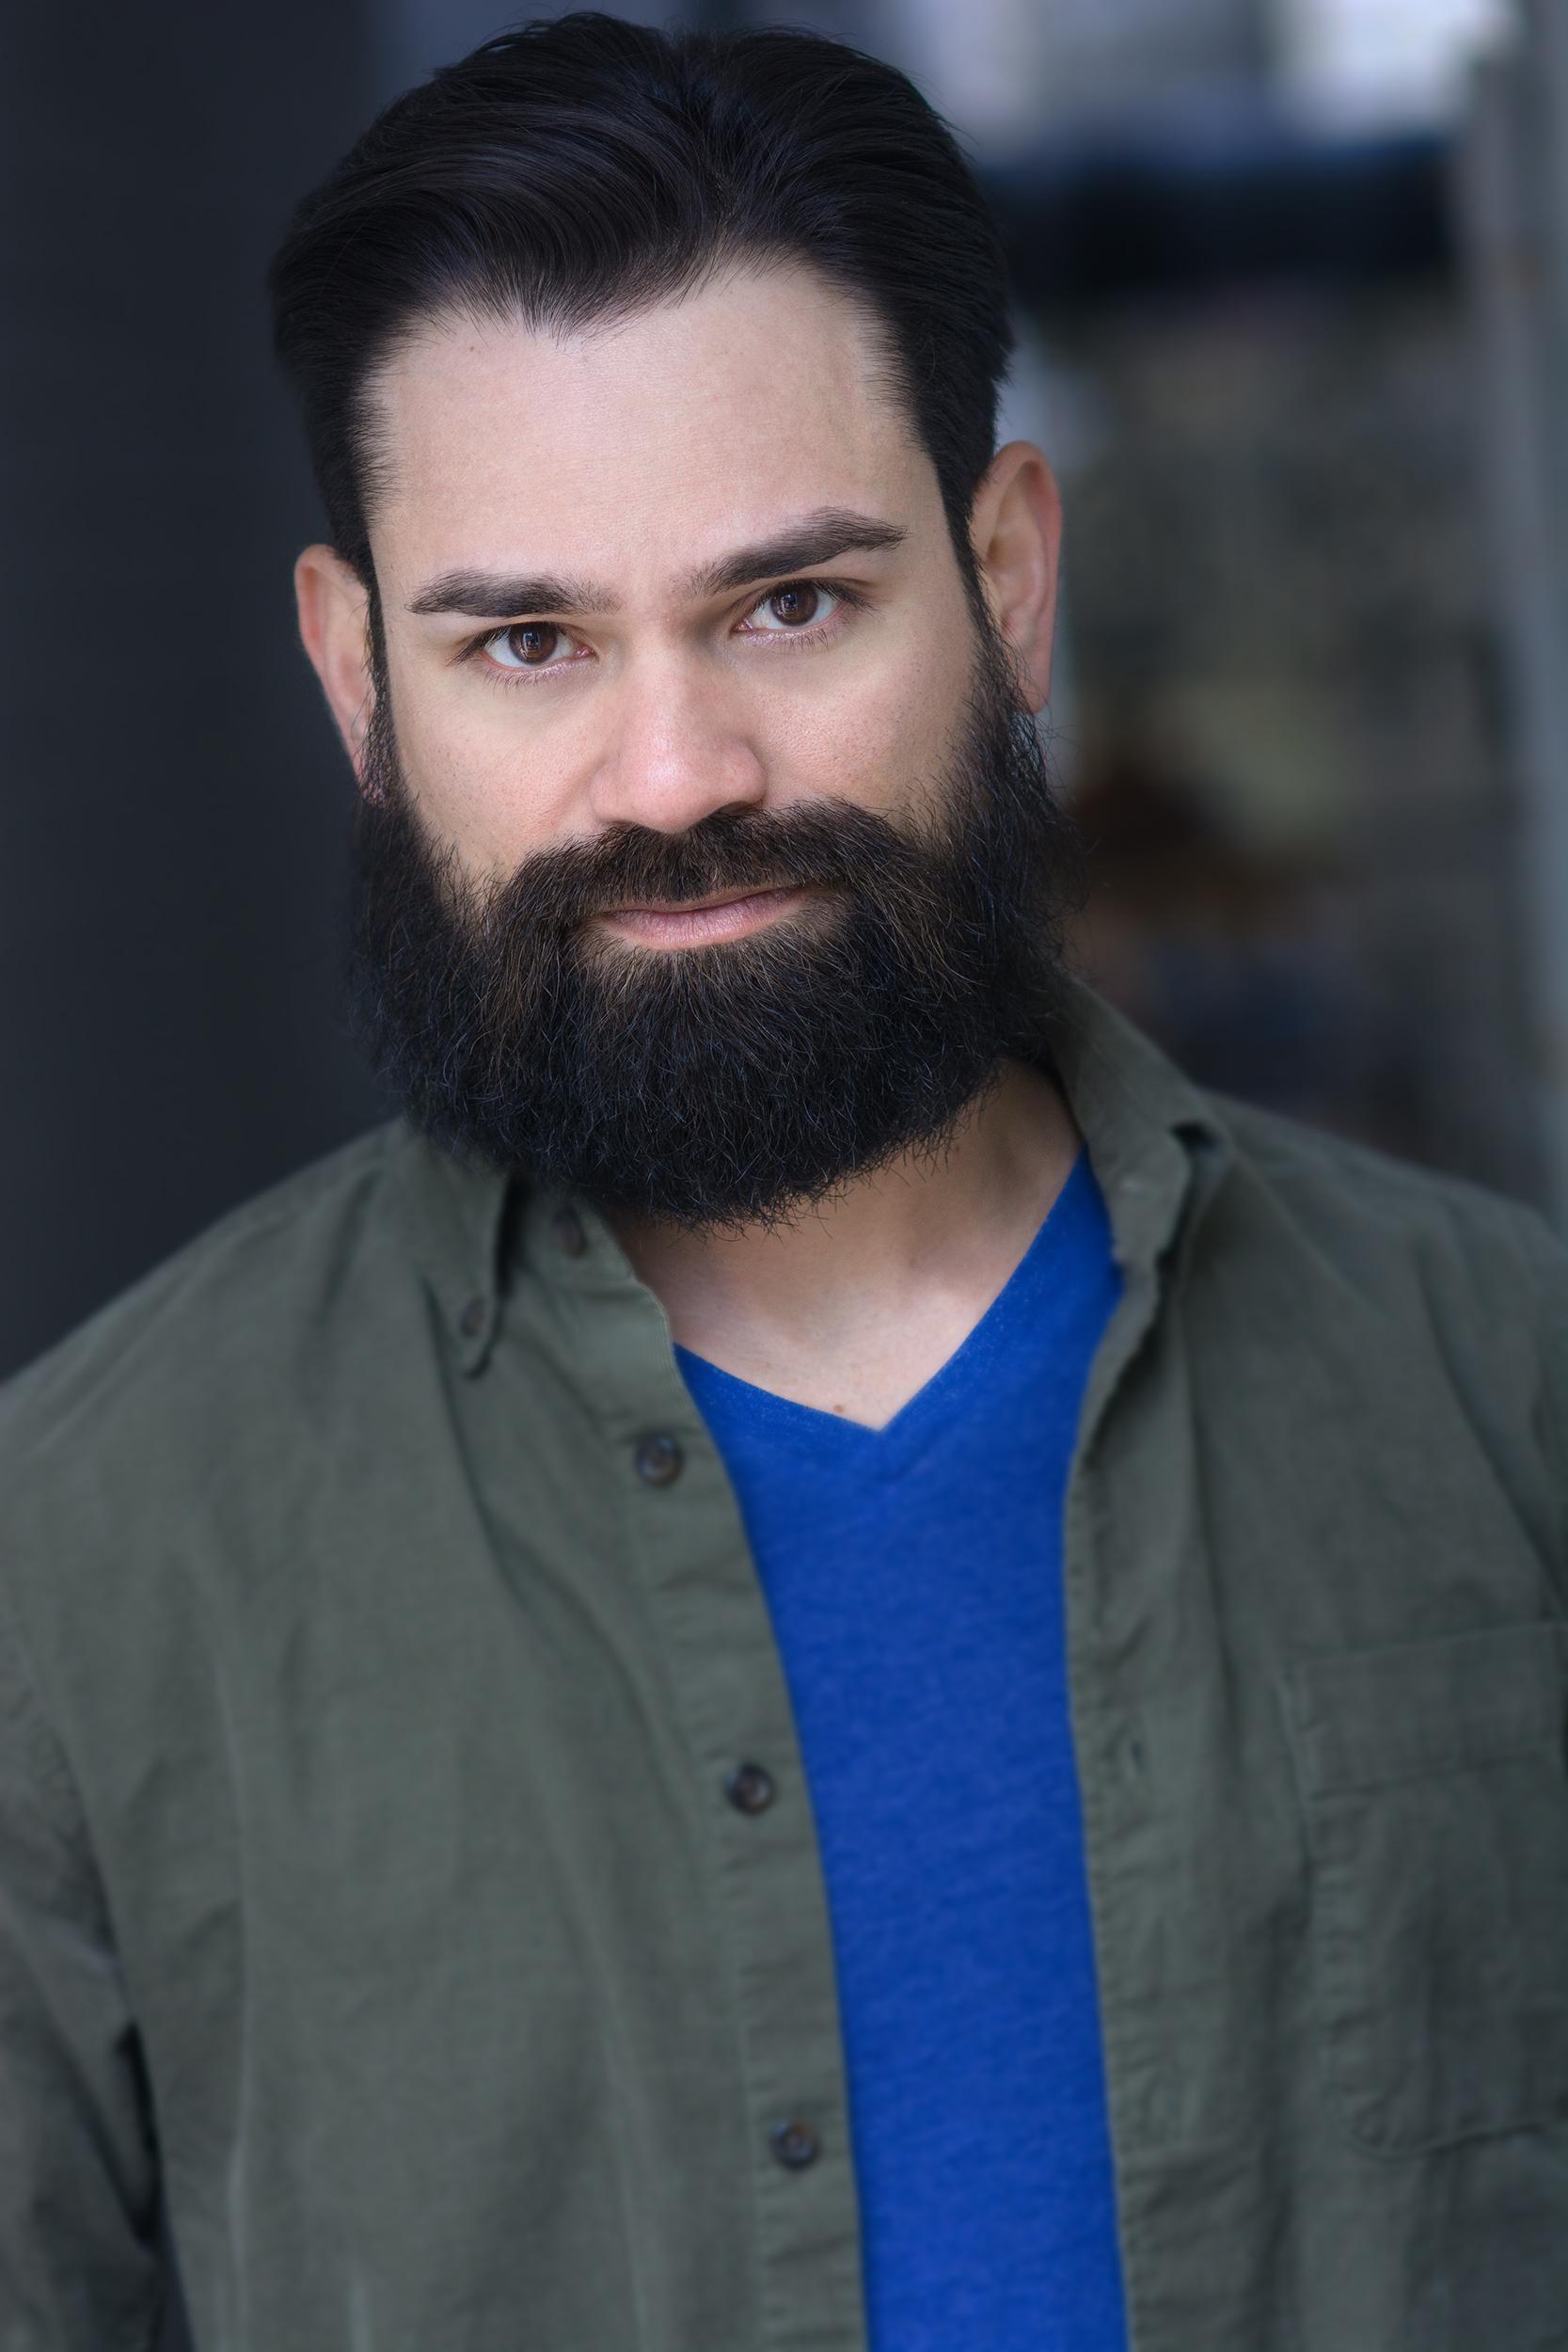 NYC Headshot Photographer